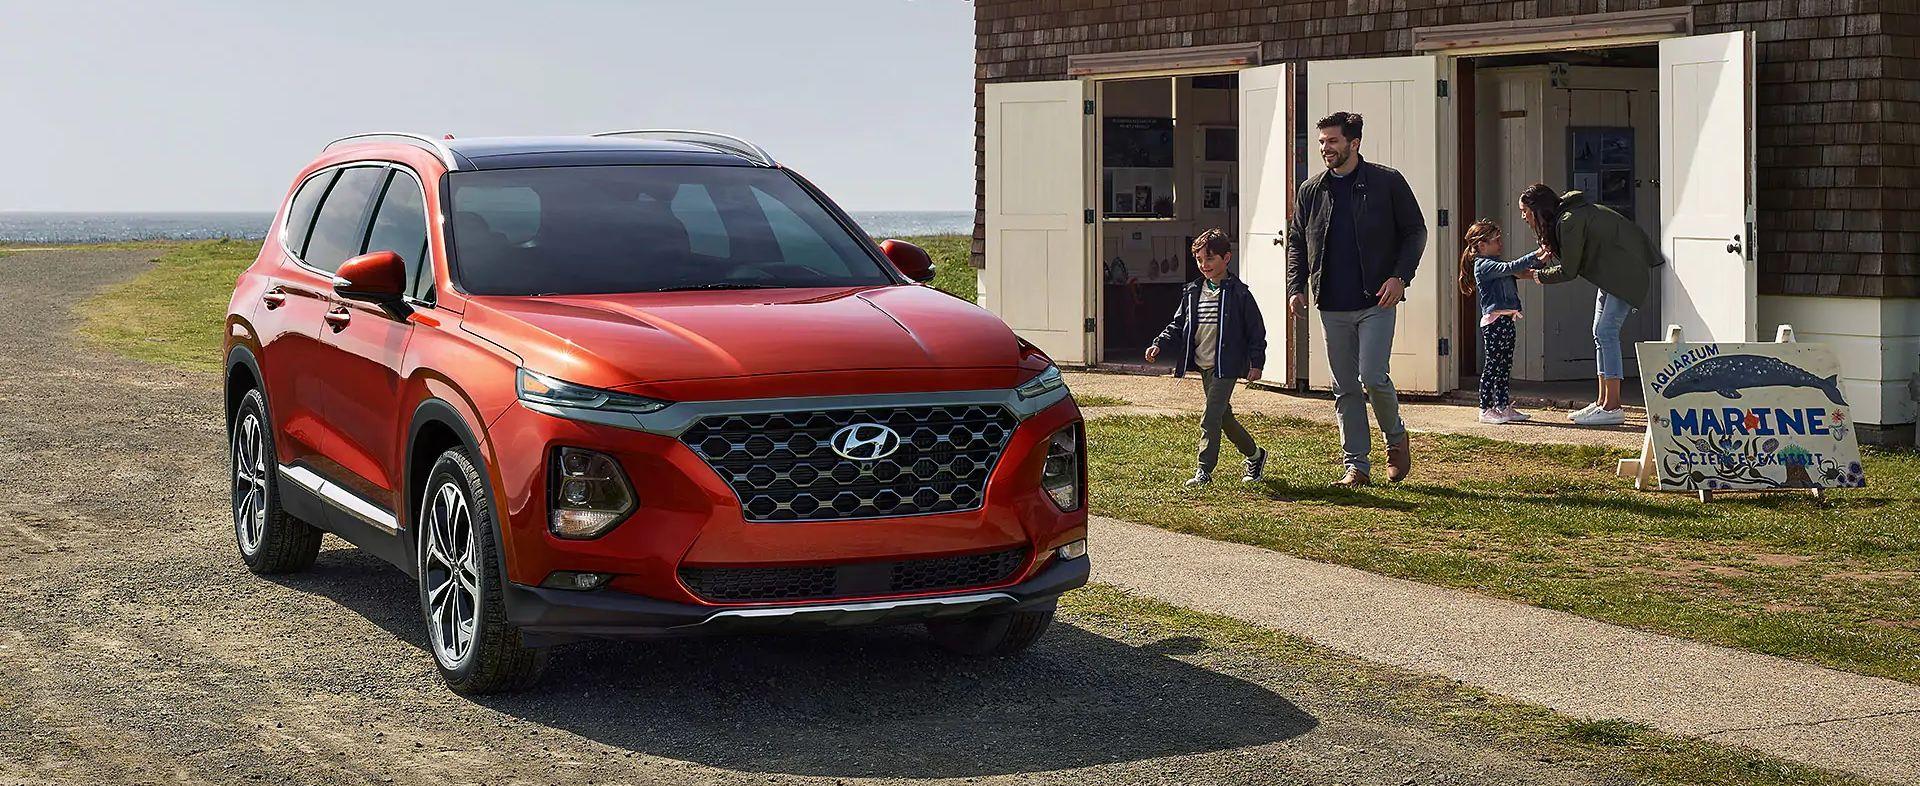 Hyundai Santa Fe 2019 a la venta cerca de Woodbridge, VA